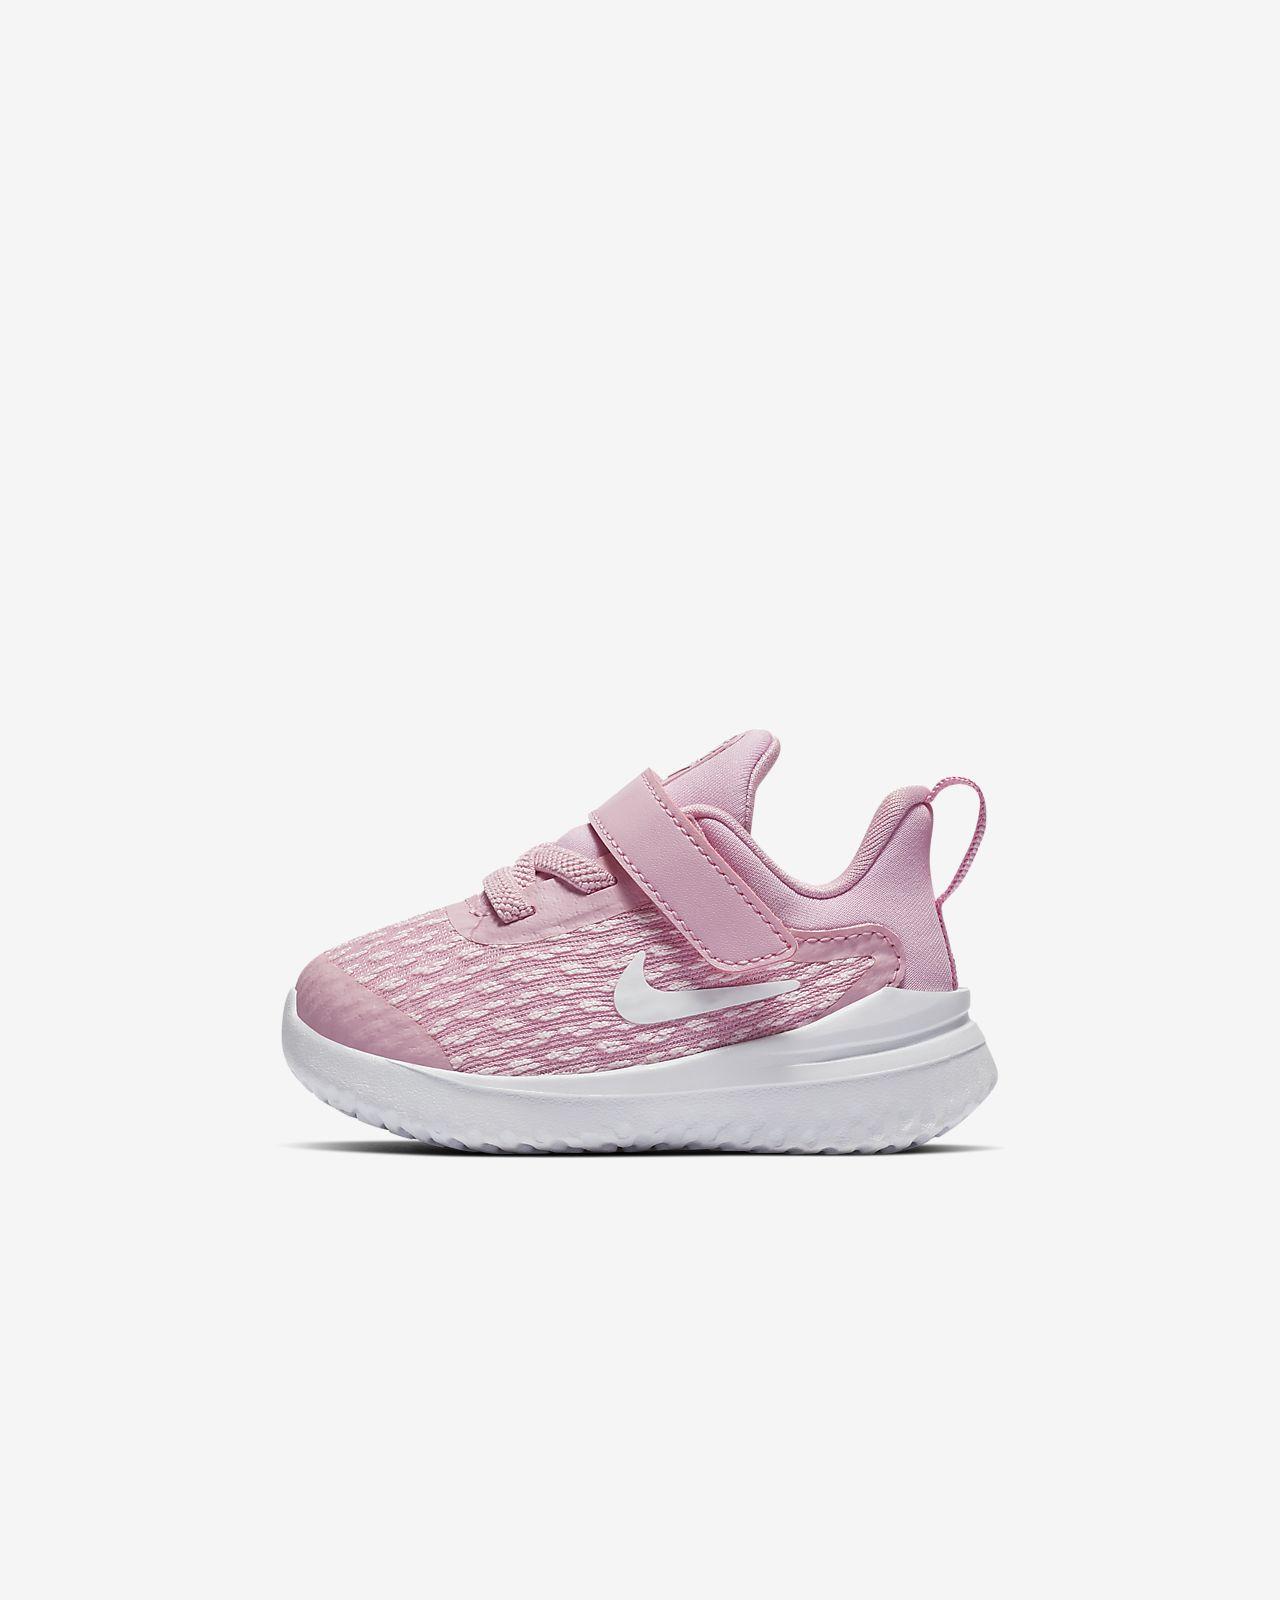 Bota Nike Rival pro kojence a batolata